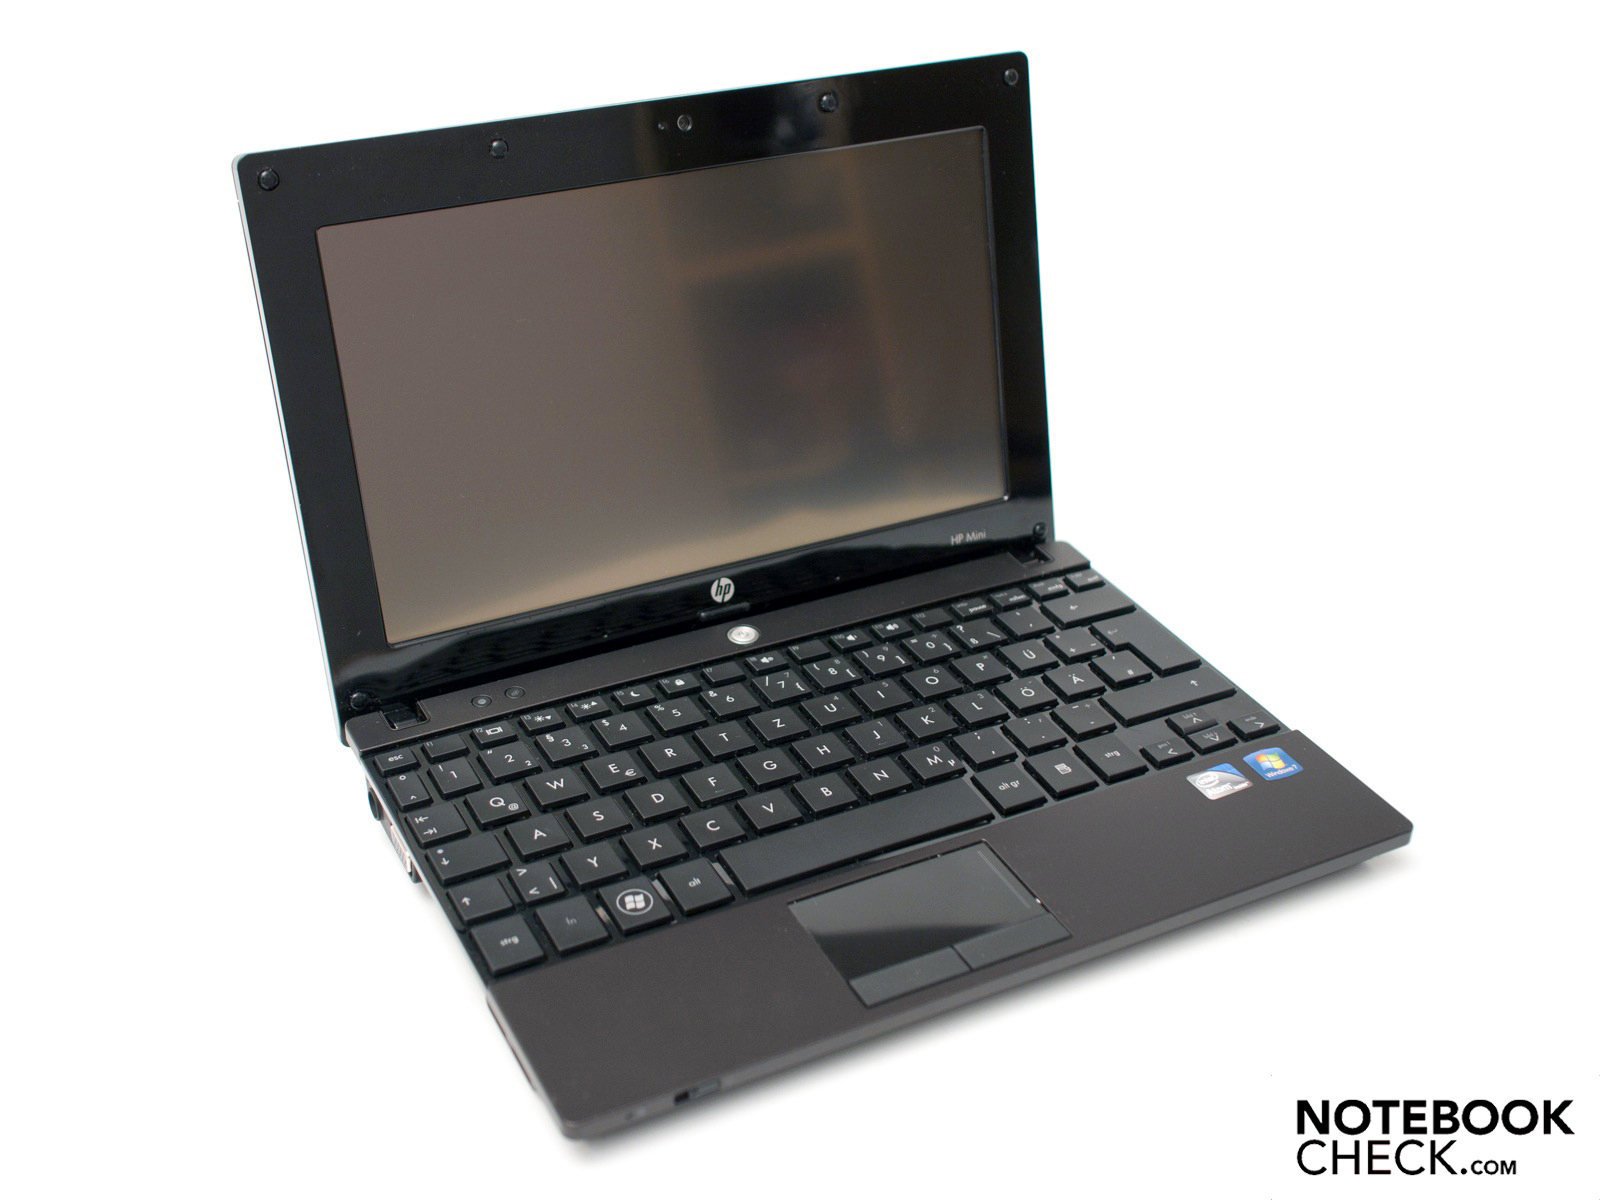 HP Mini 100-1125NR Notebook Broadcom Decoder Card Drivers for Windows 7